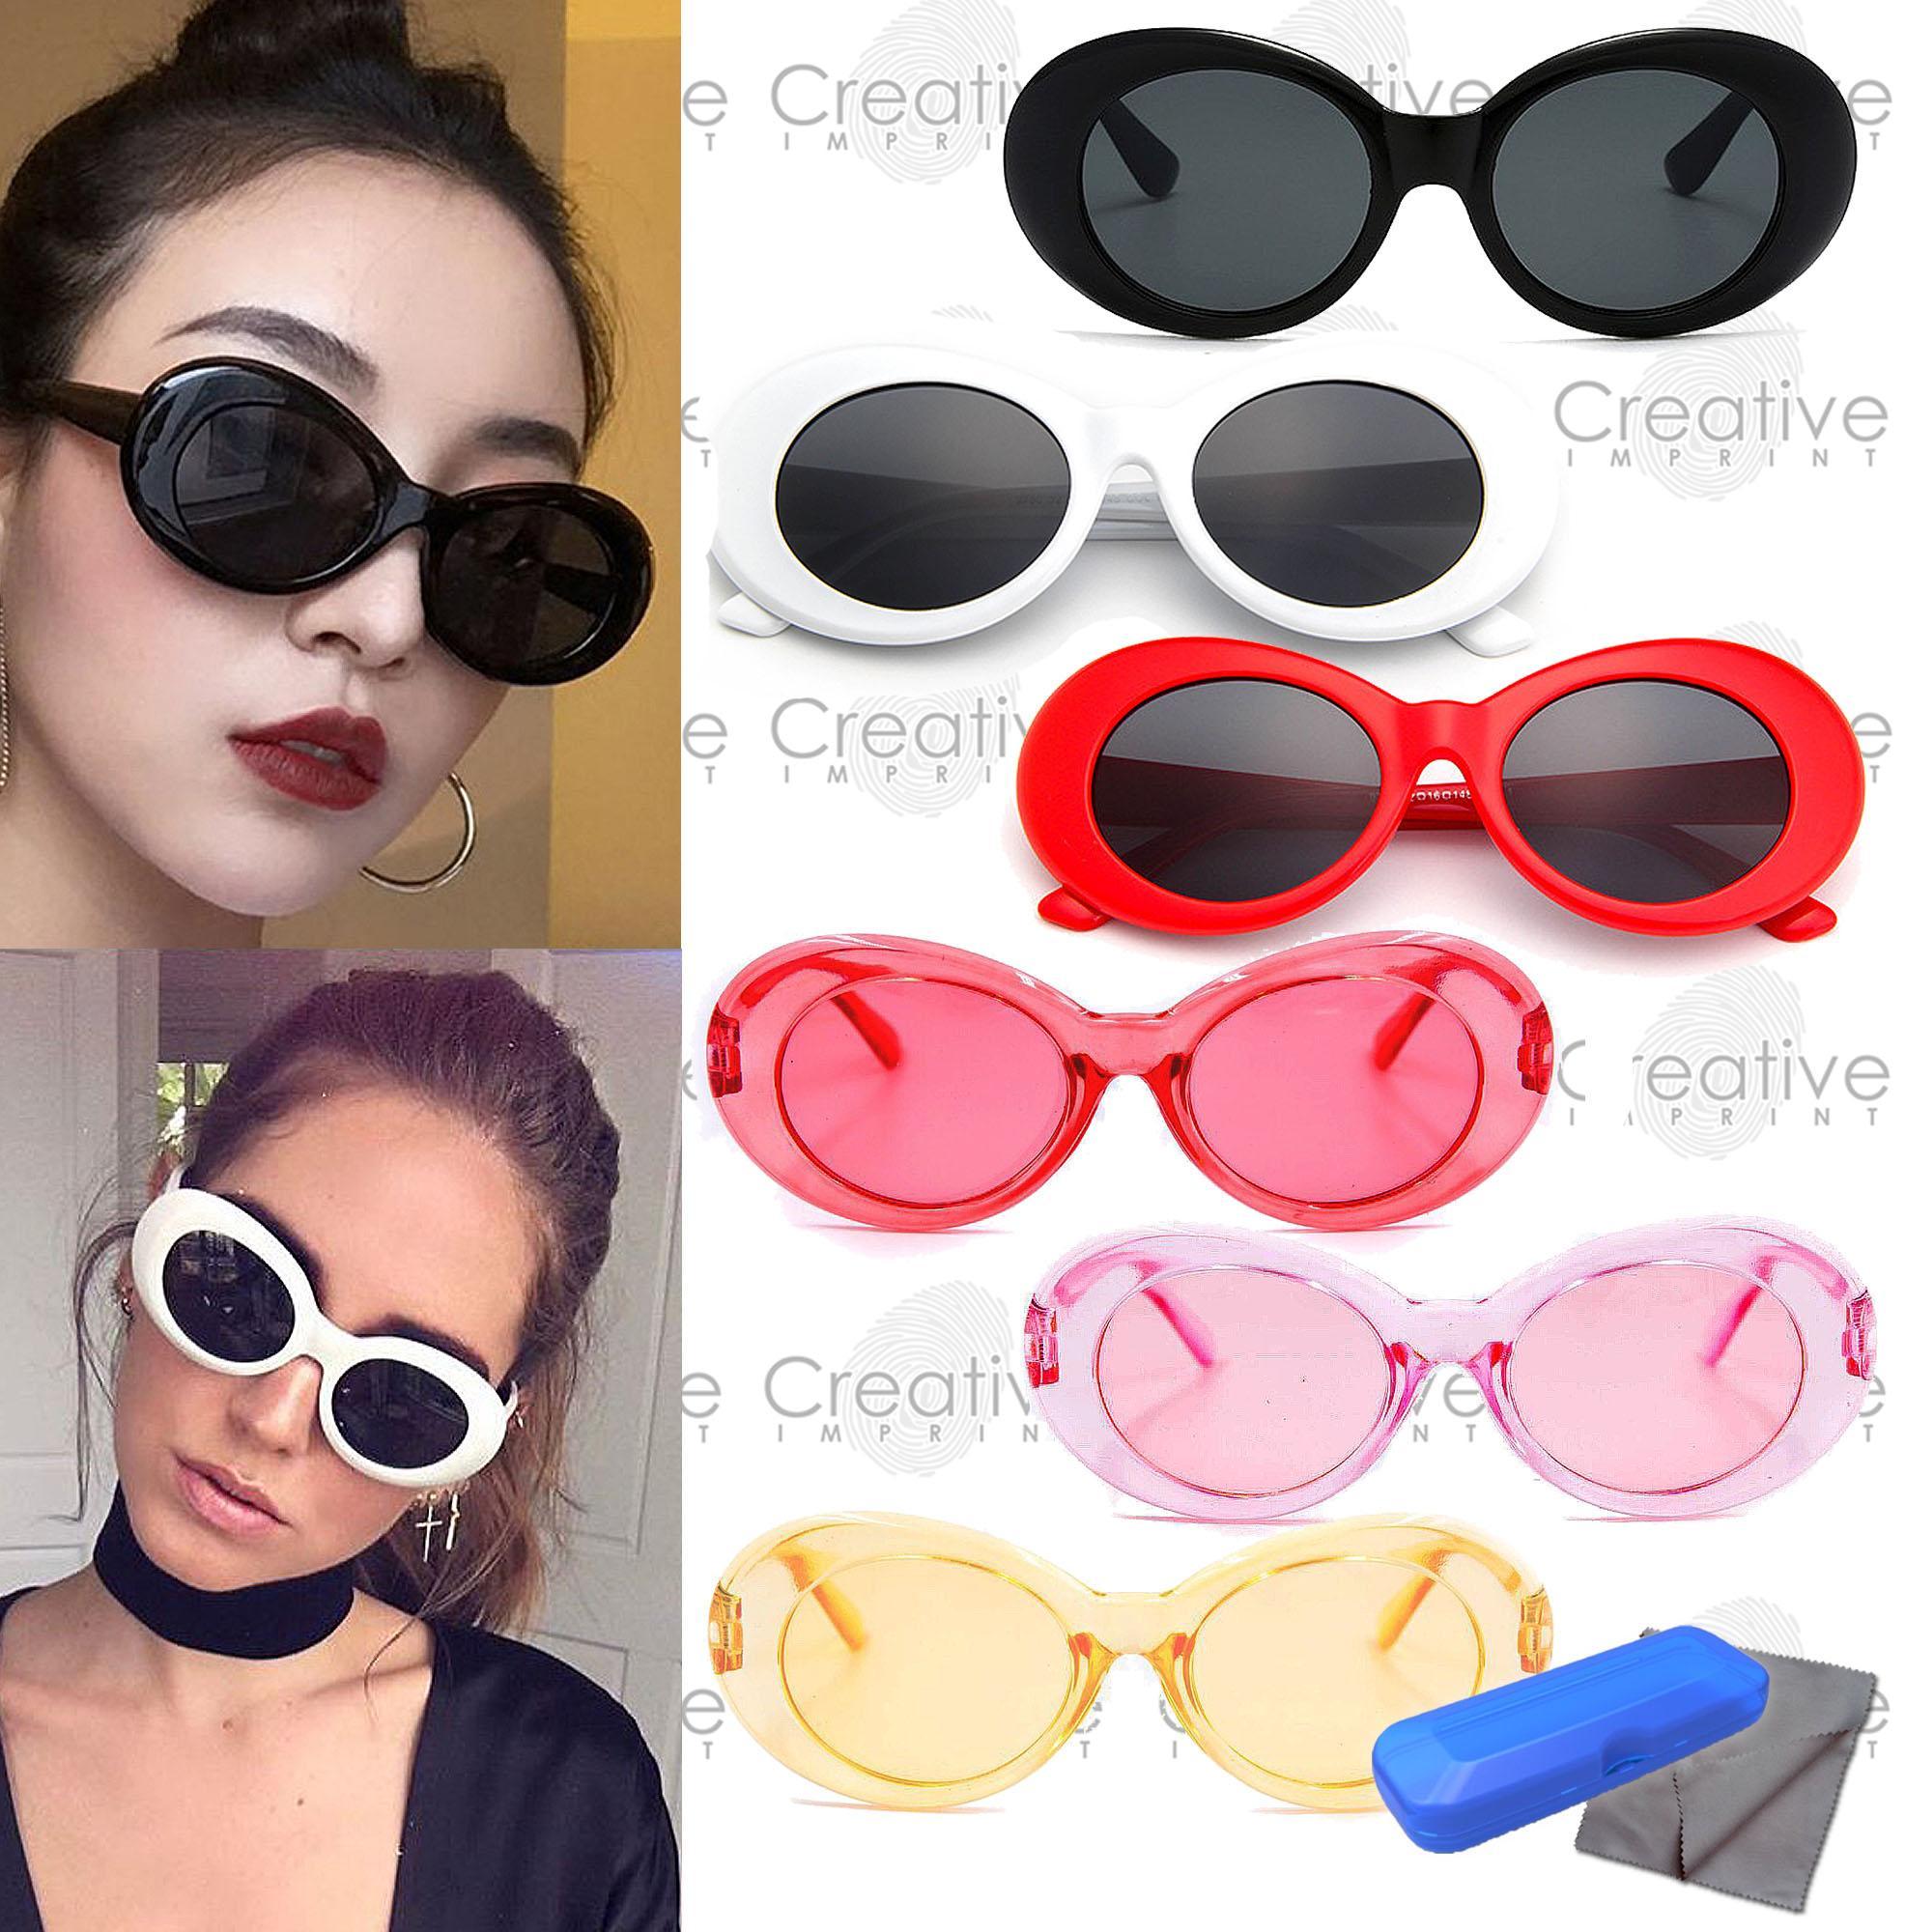 2f61c6d0b43 Creative Imprint Oval Goggle Sunnies (FREE CASE   WIPER) Sunnies High Fashion  Trendy Korean